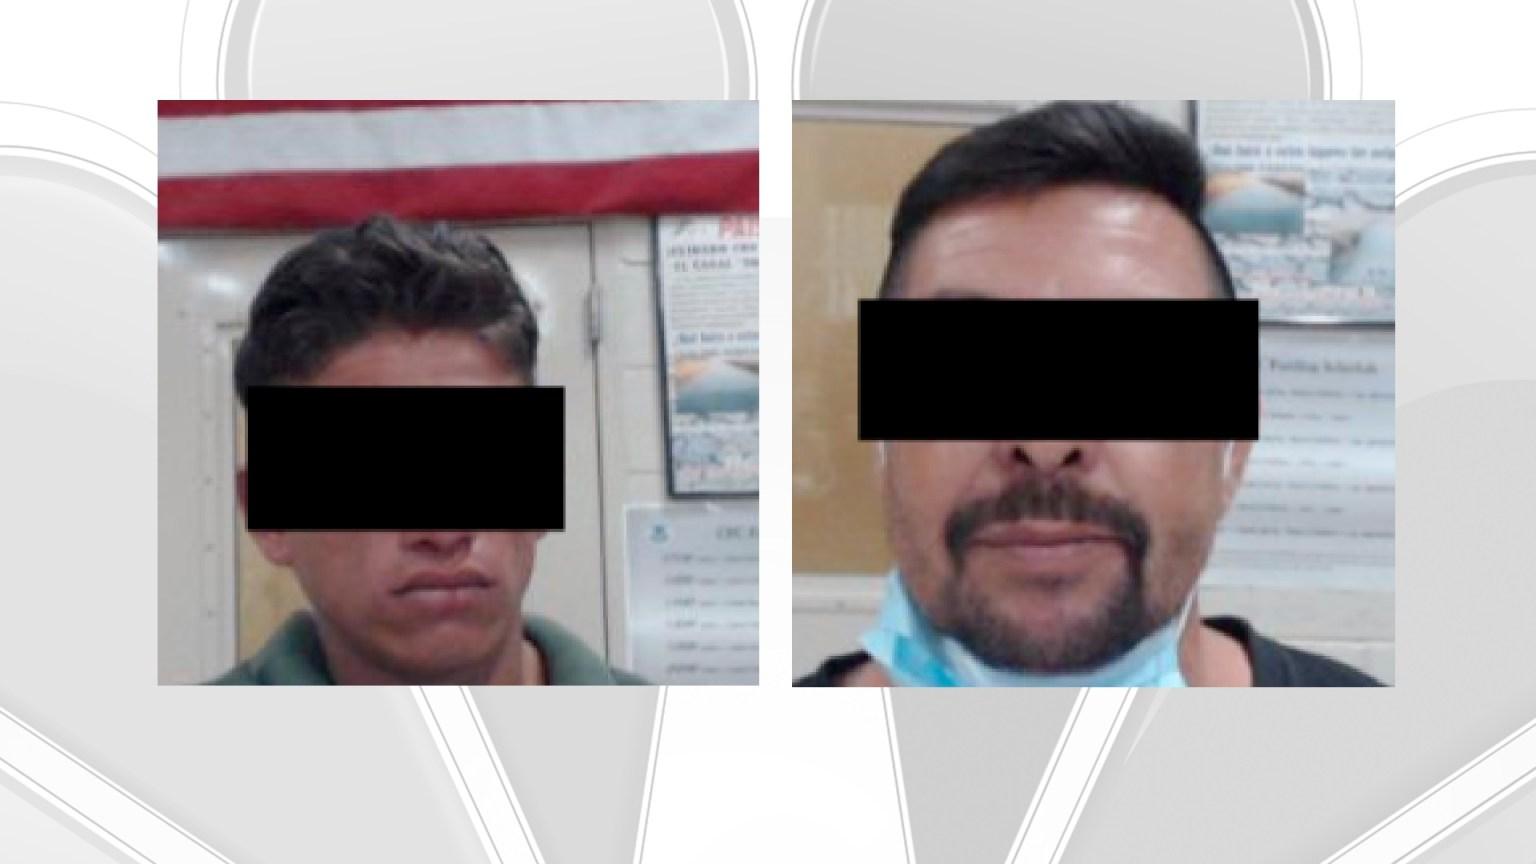 Border Patrol Apprehends Two Dangerous Men on the Same Day